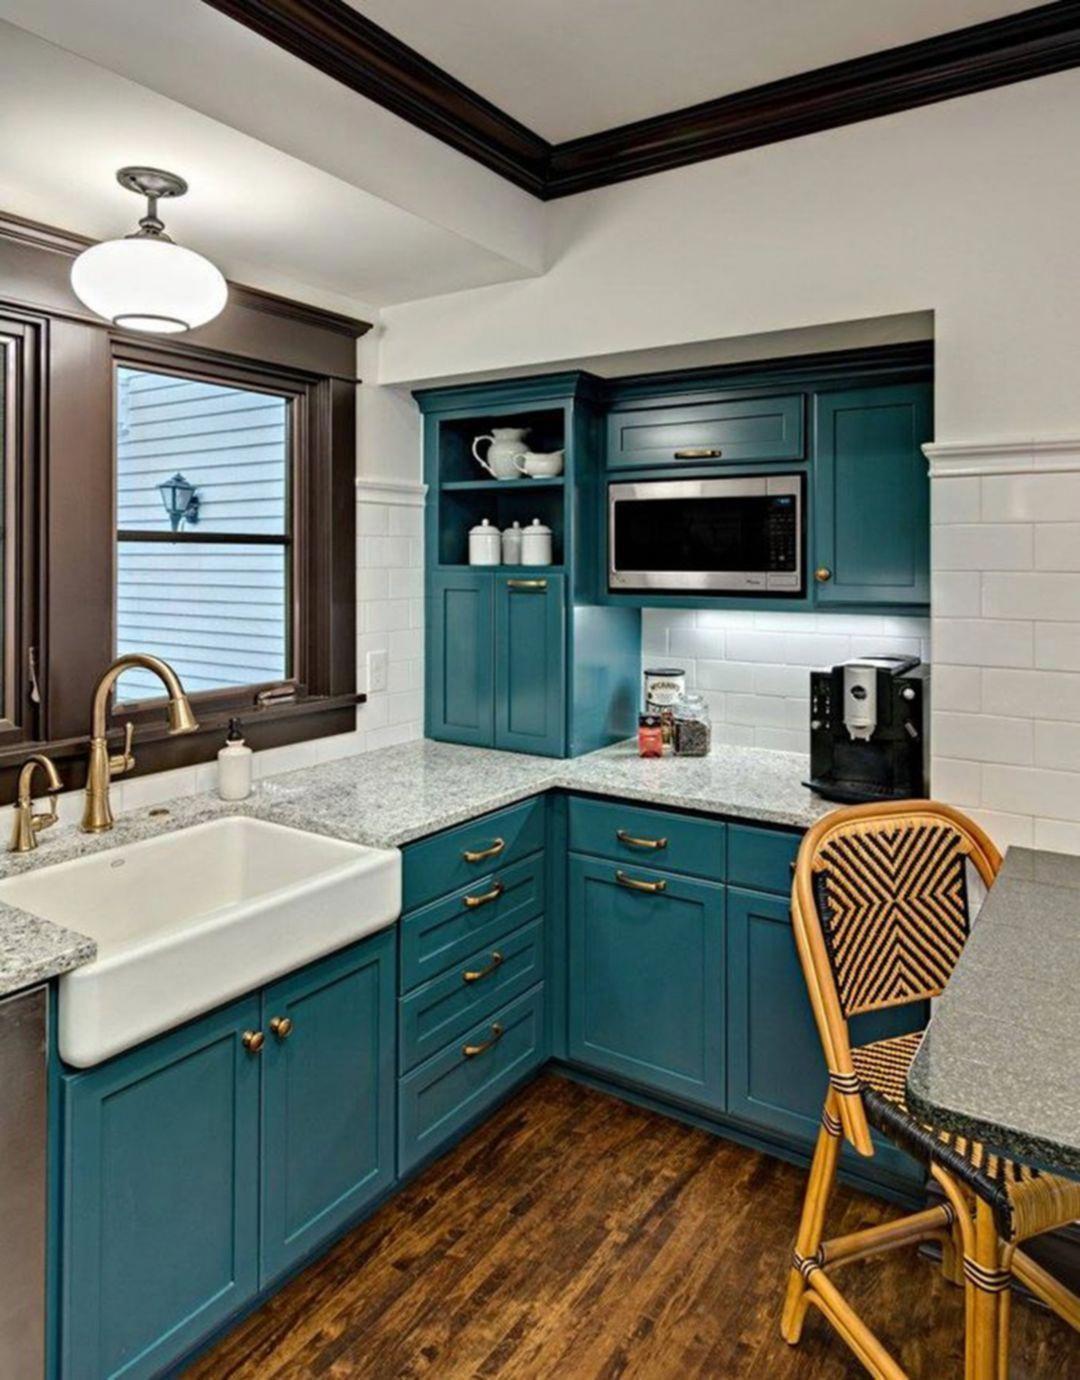 15 Adorable Turquoise Room Ideas Kitchen Design Turquoise Kitchen Cabinets Home Kitchens